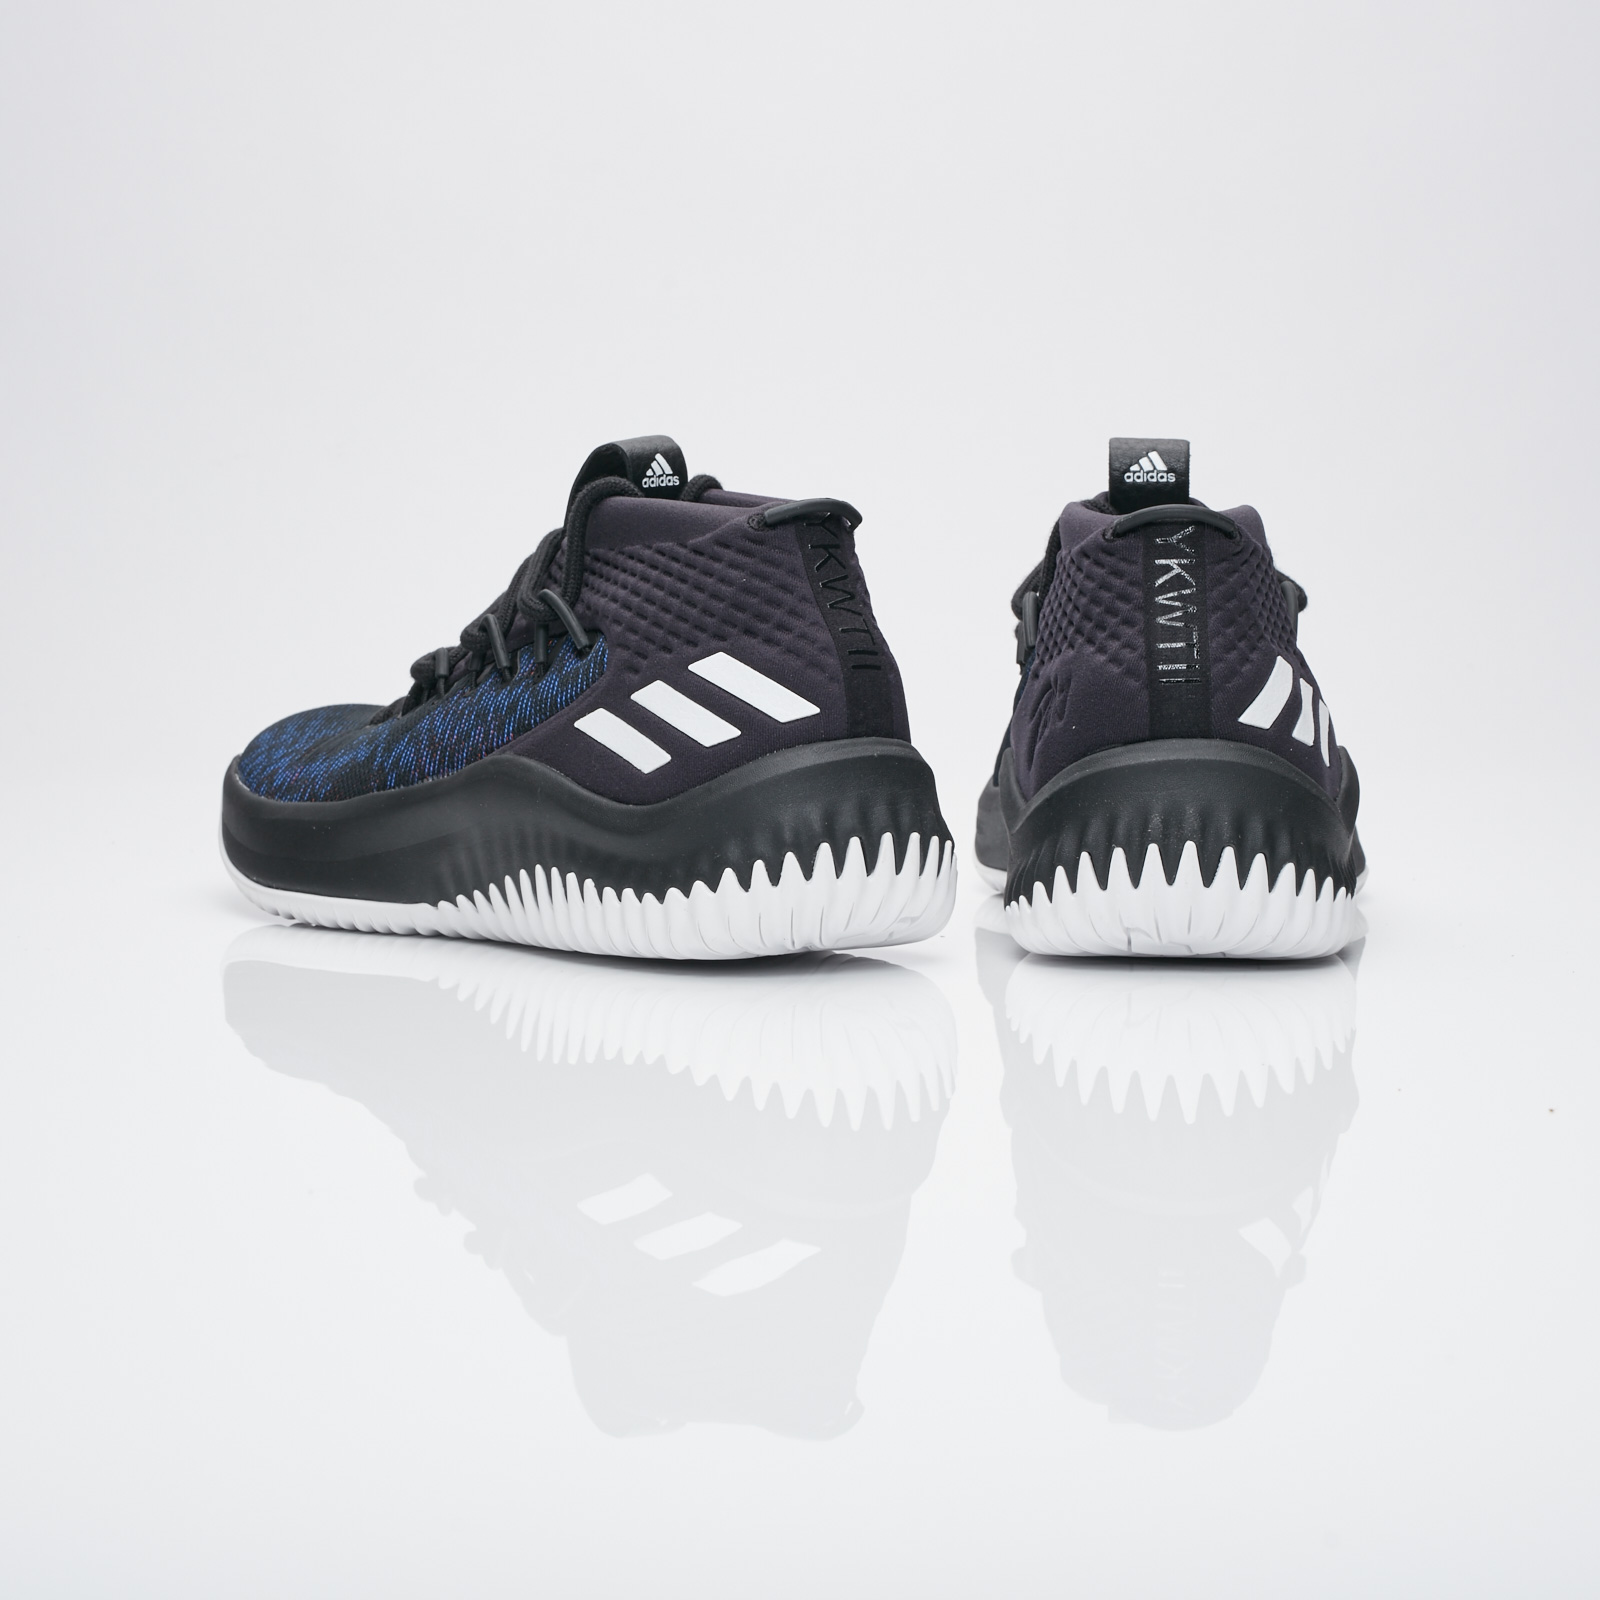 b5b7033e9bd0 adidas Dame 4 - Cq0477 - Sneakersnstuff